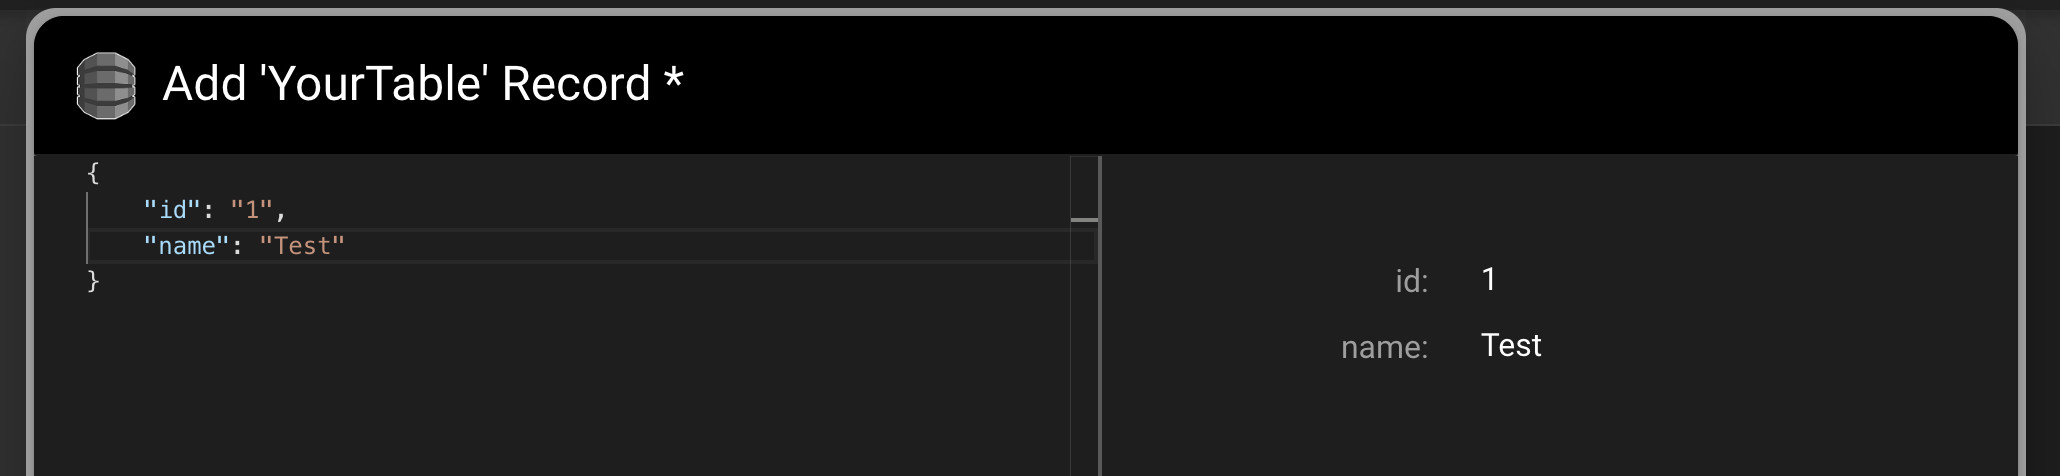 Previewing DynamoDB record as you type